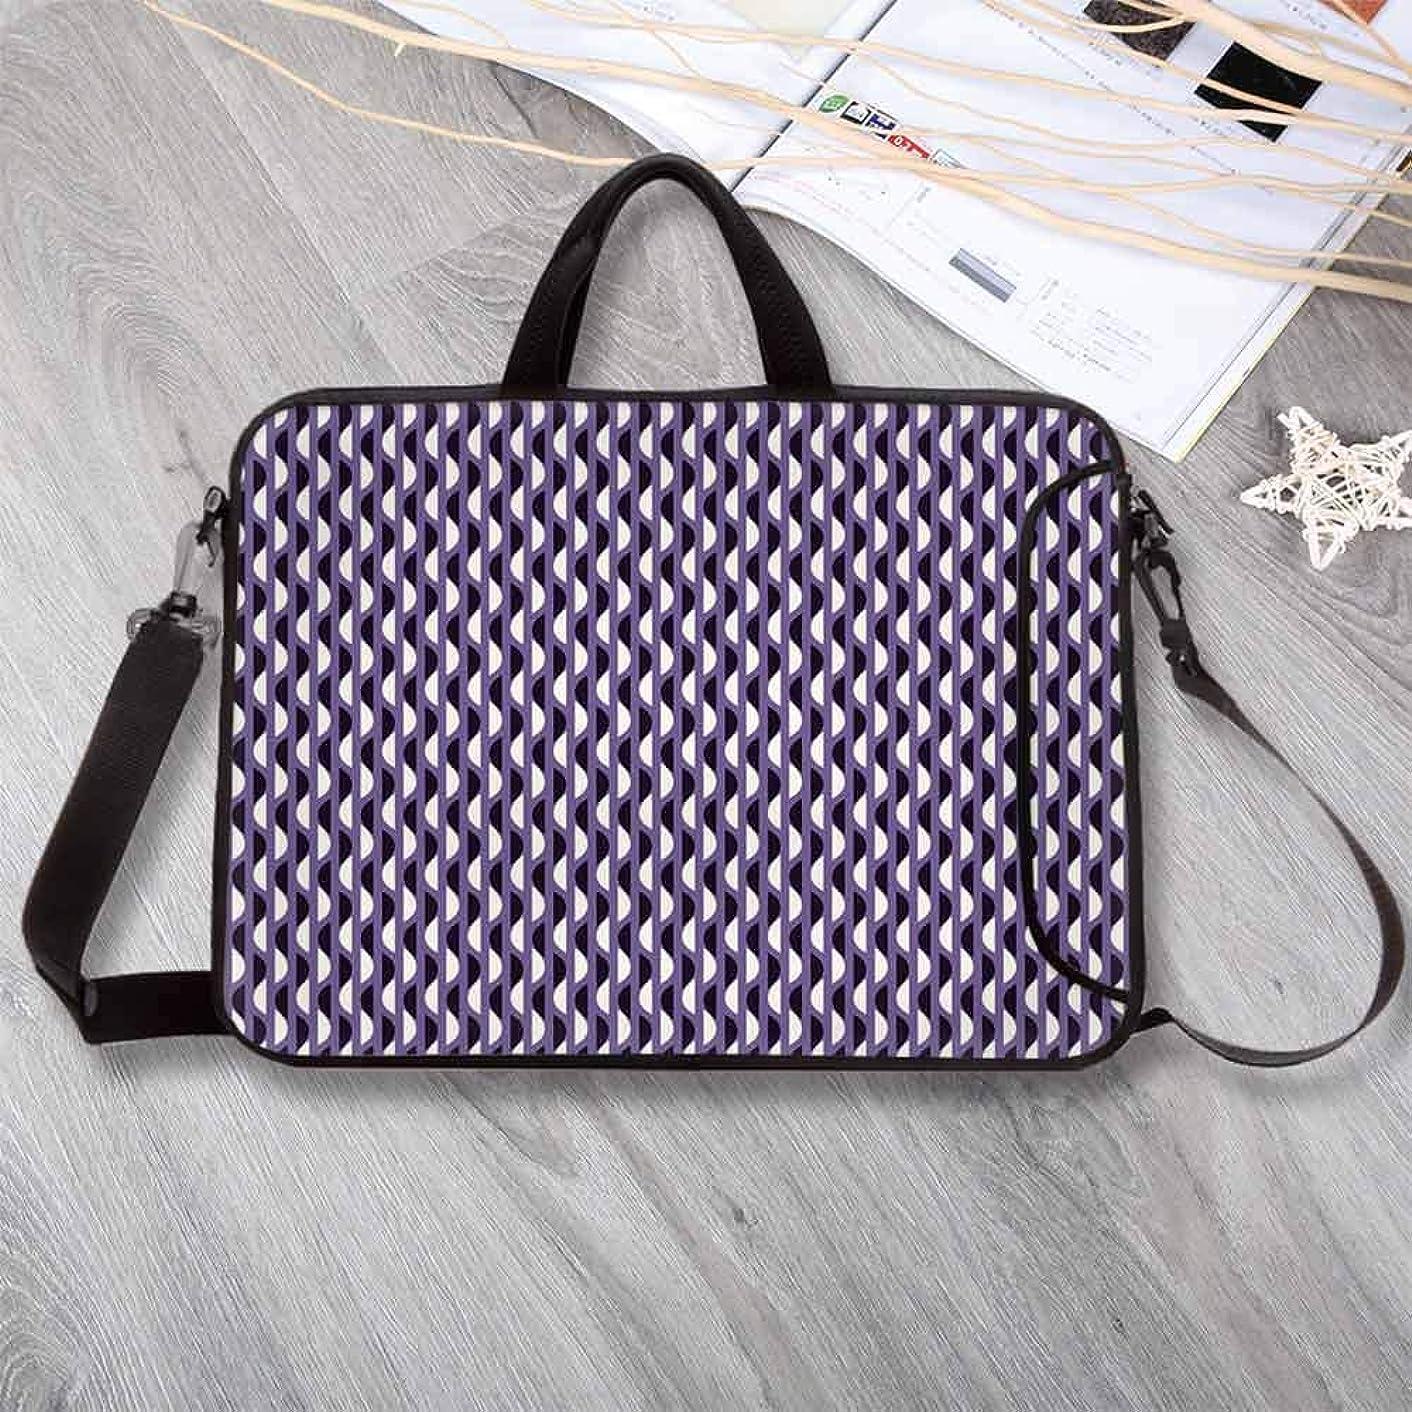 "Geometric Custom Neoprene Laptop Bag,Vivid Half Circles Pattern Vertical Design Geometric Elements Laptop Bag for Men Women Students,13.8""L x 10.2""W x 0.8""H"